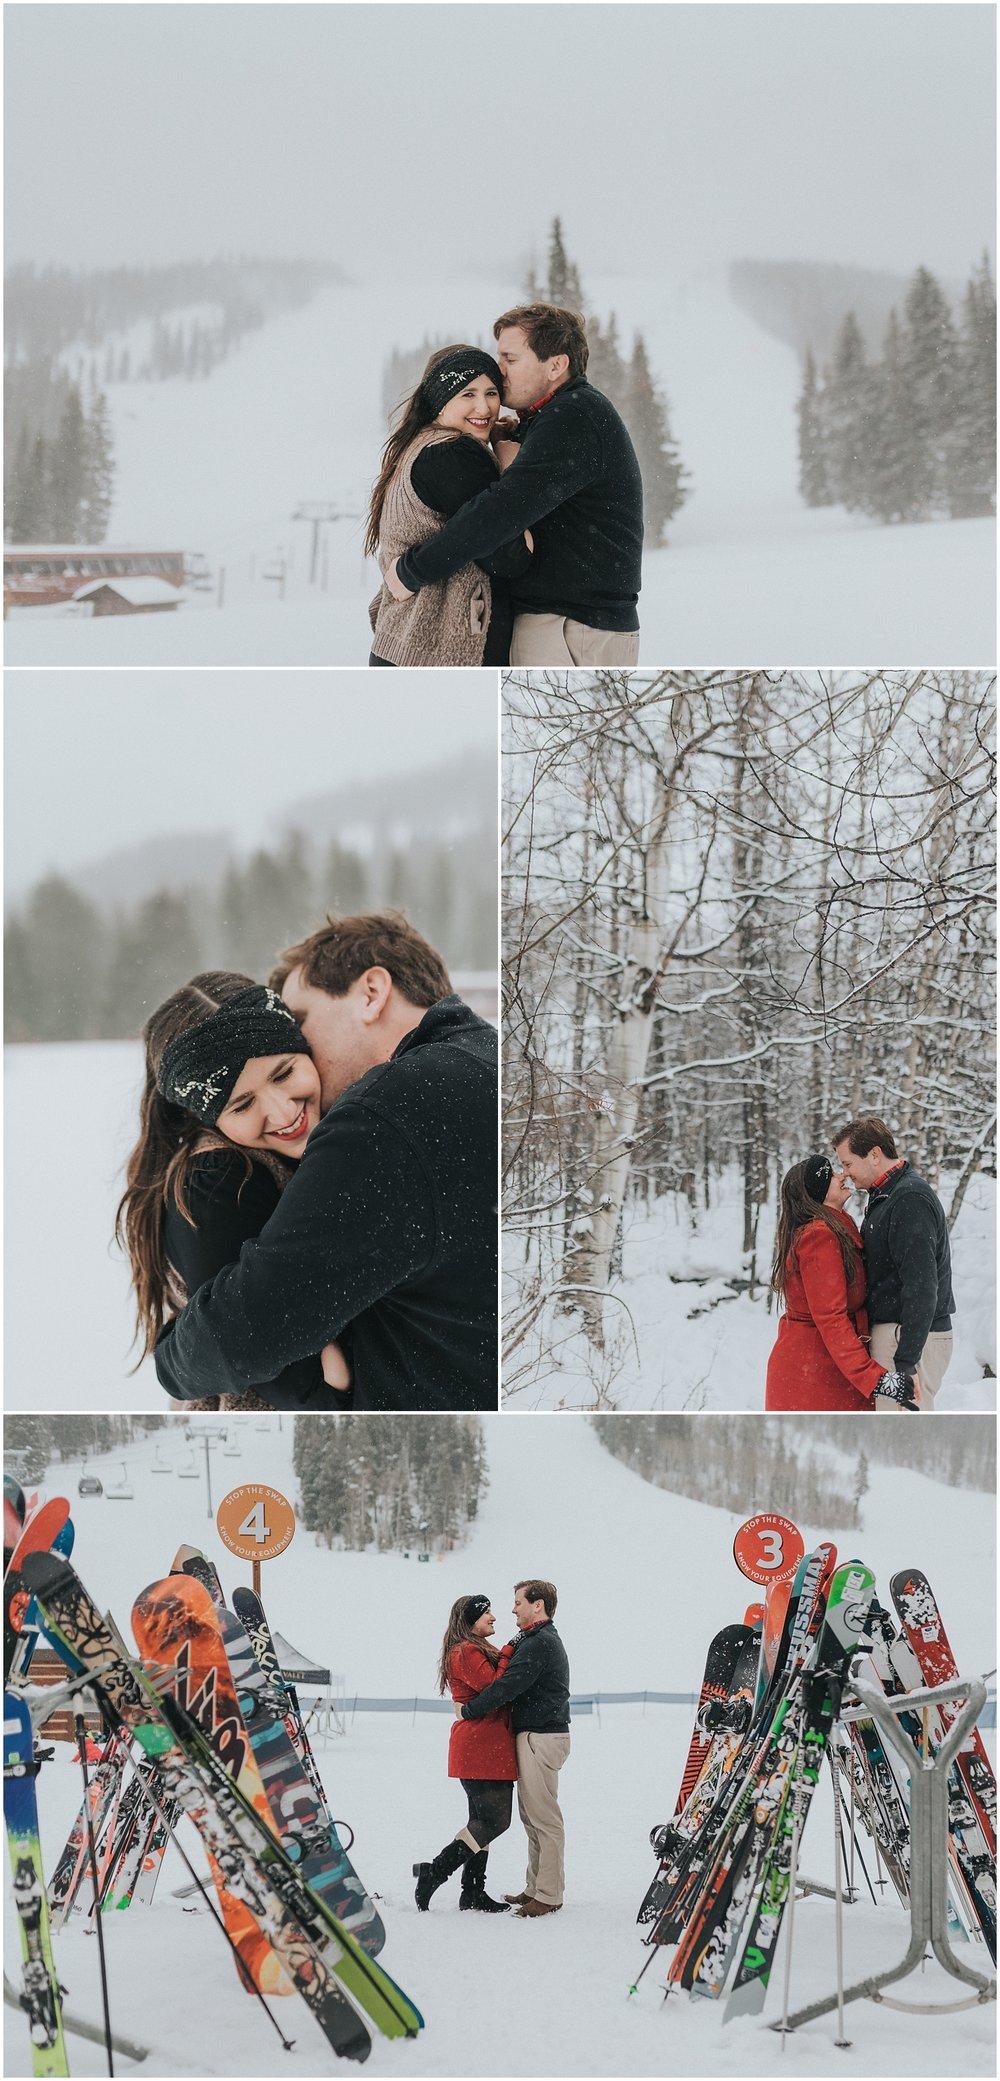 beavercreek_colorado_winter_engagement_photos_0021.jpg